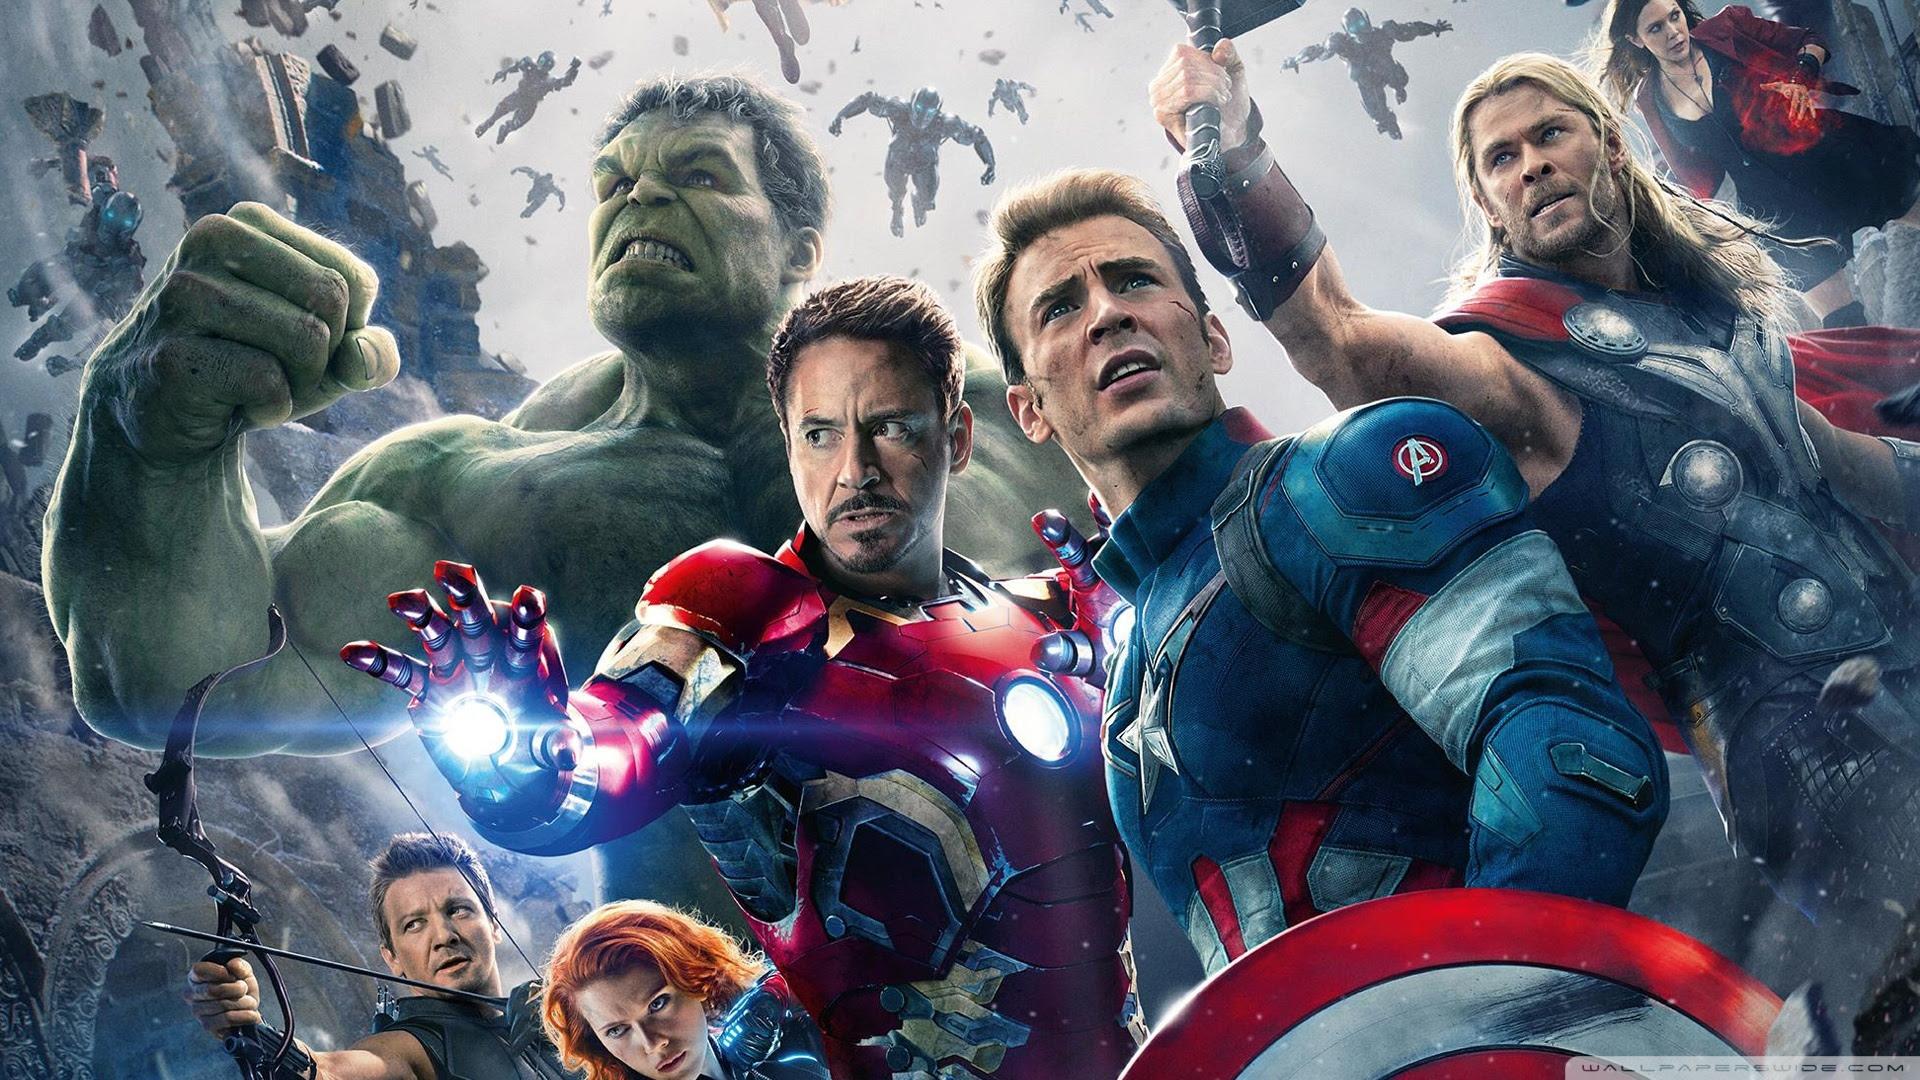 Wallpaperswide Com The Avengers Hd Desktop Wallpapers For 4k